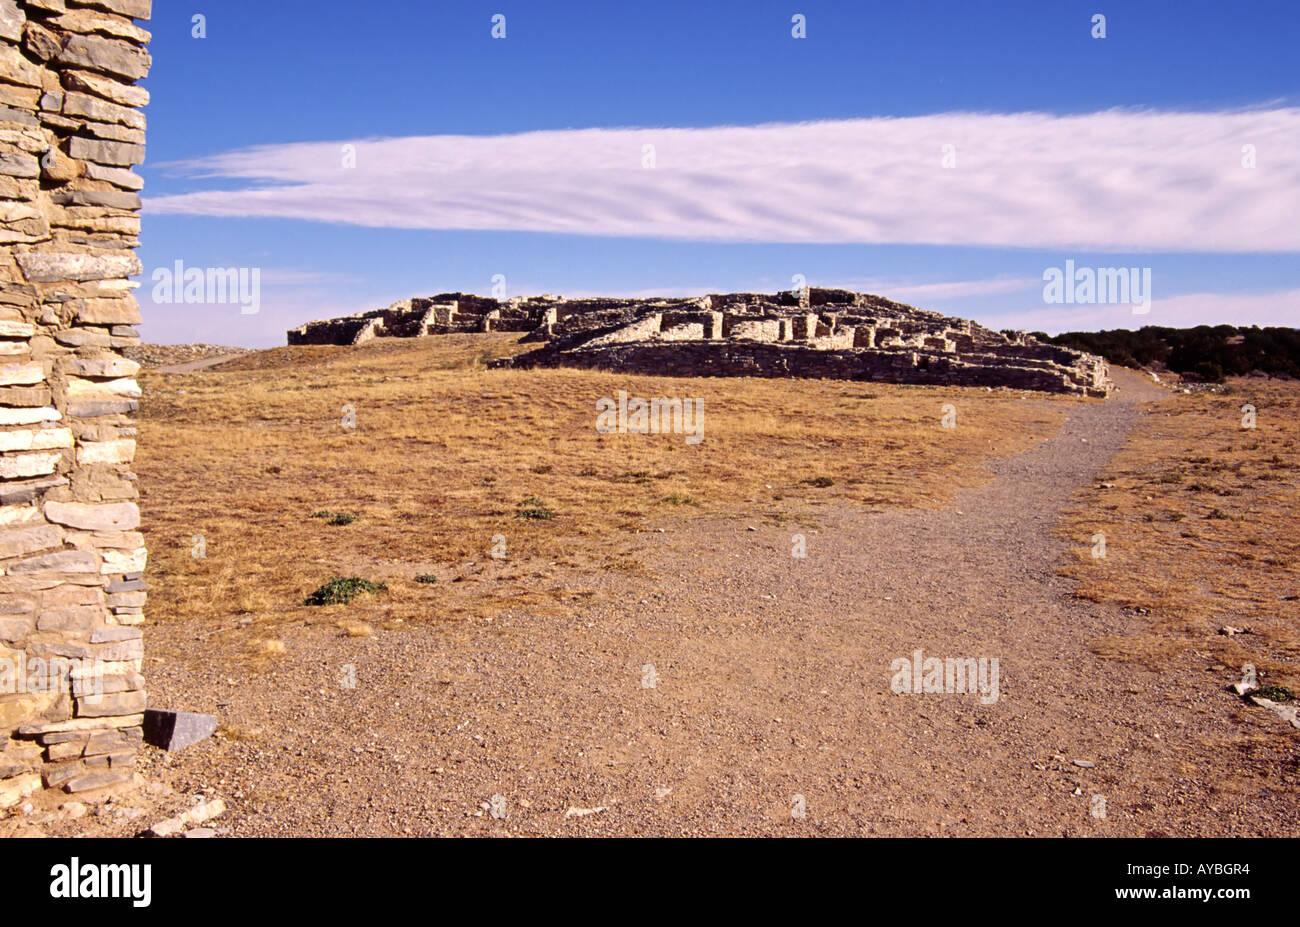 stone and adobe homes of ancient anasazi pueblo culture at gran